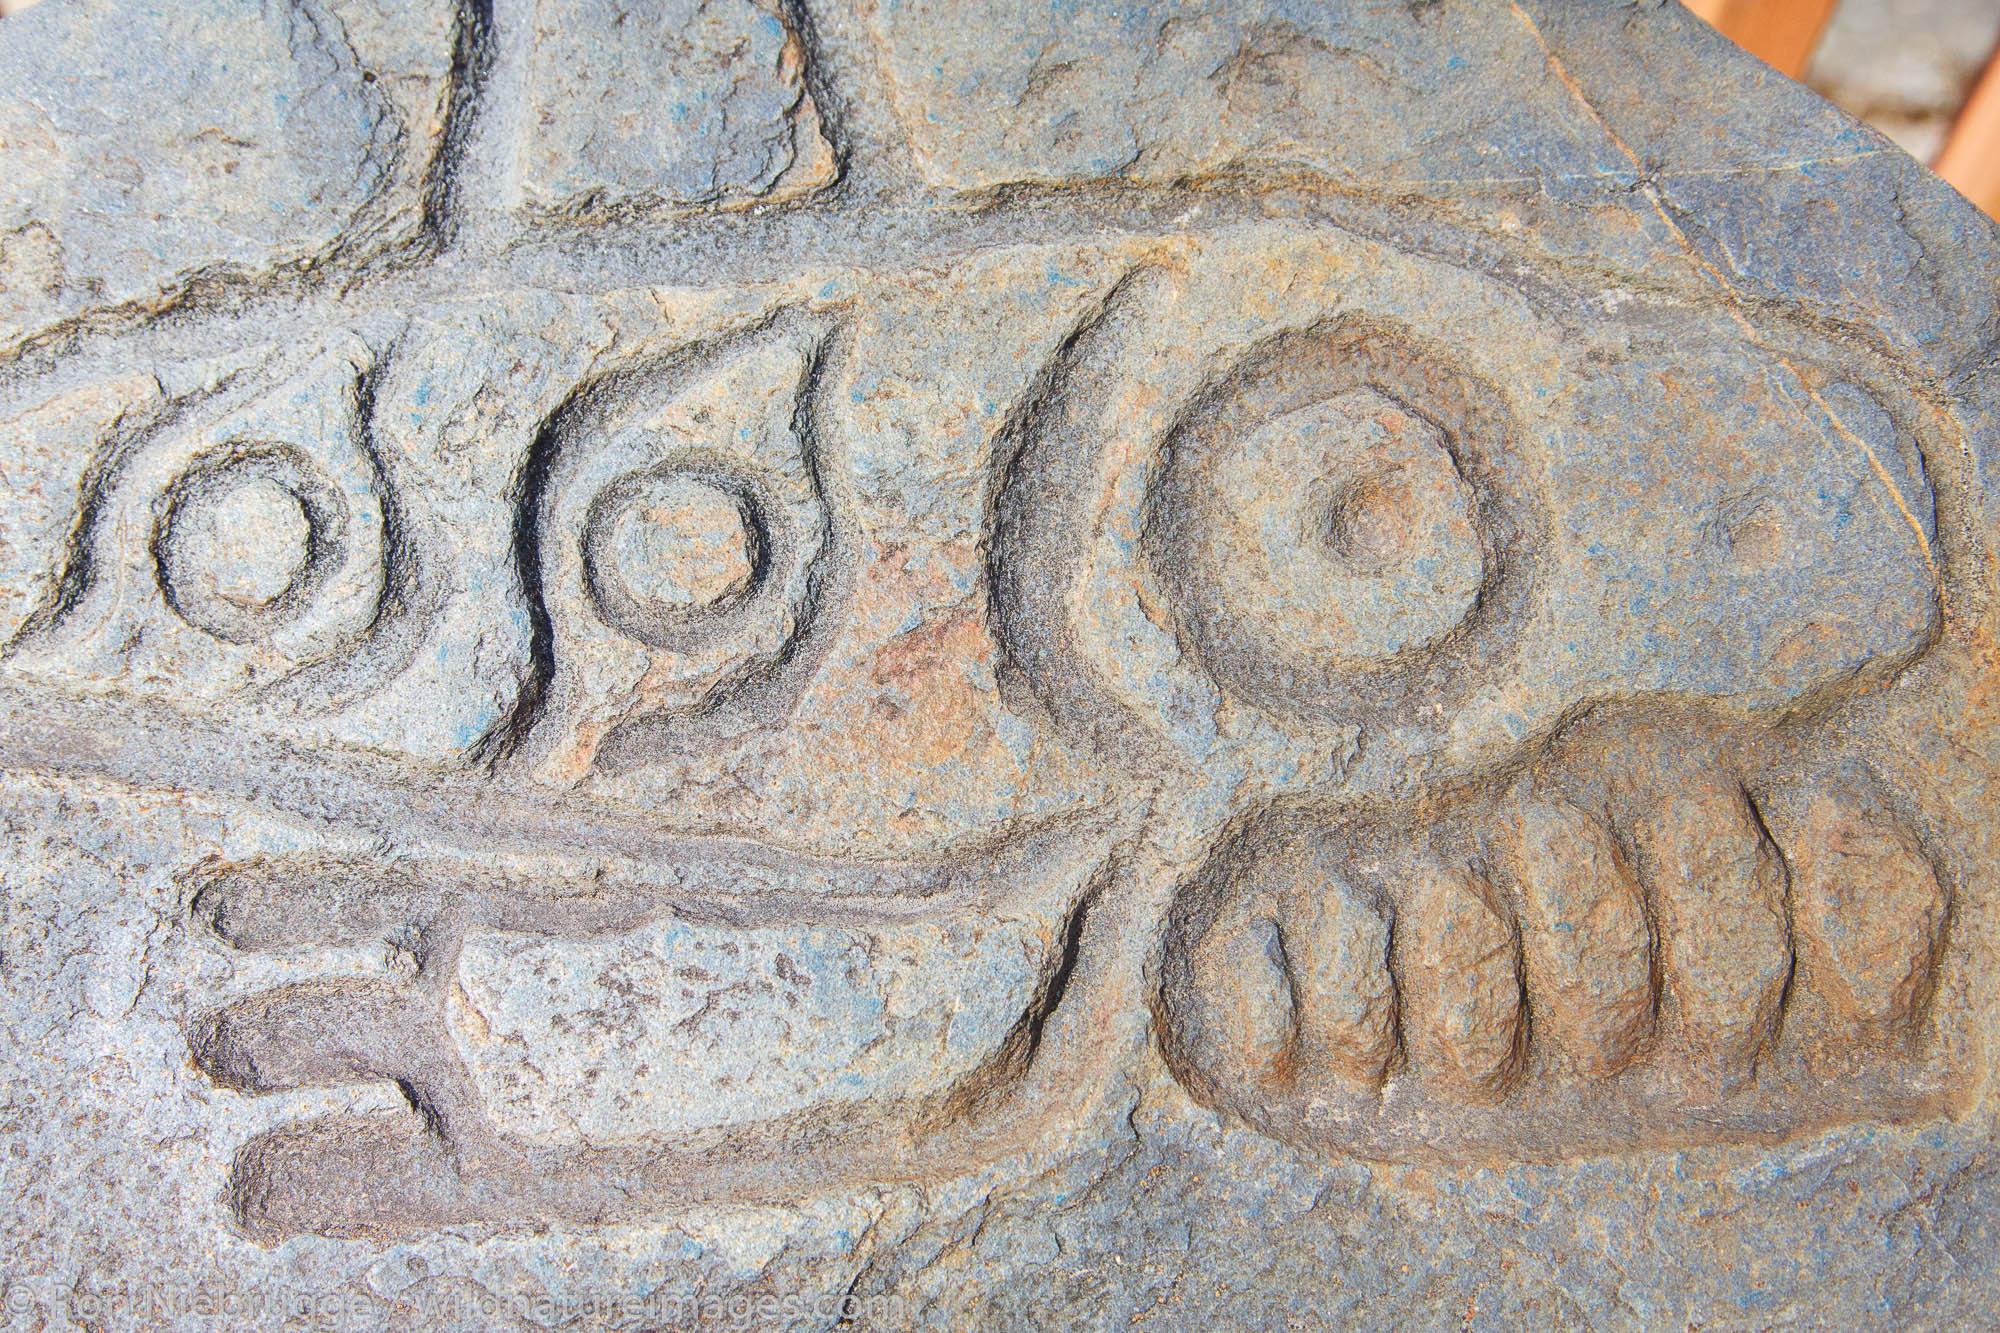 Petroglyph Beach State Historical Site, Wrangell, Alaska.